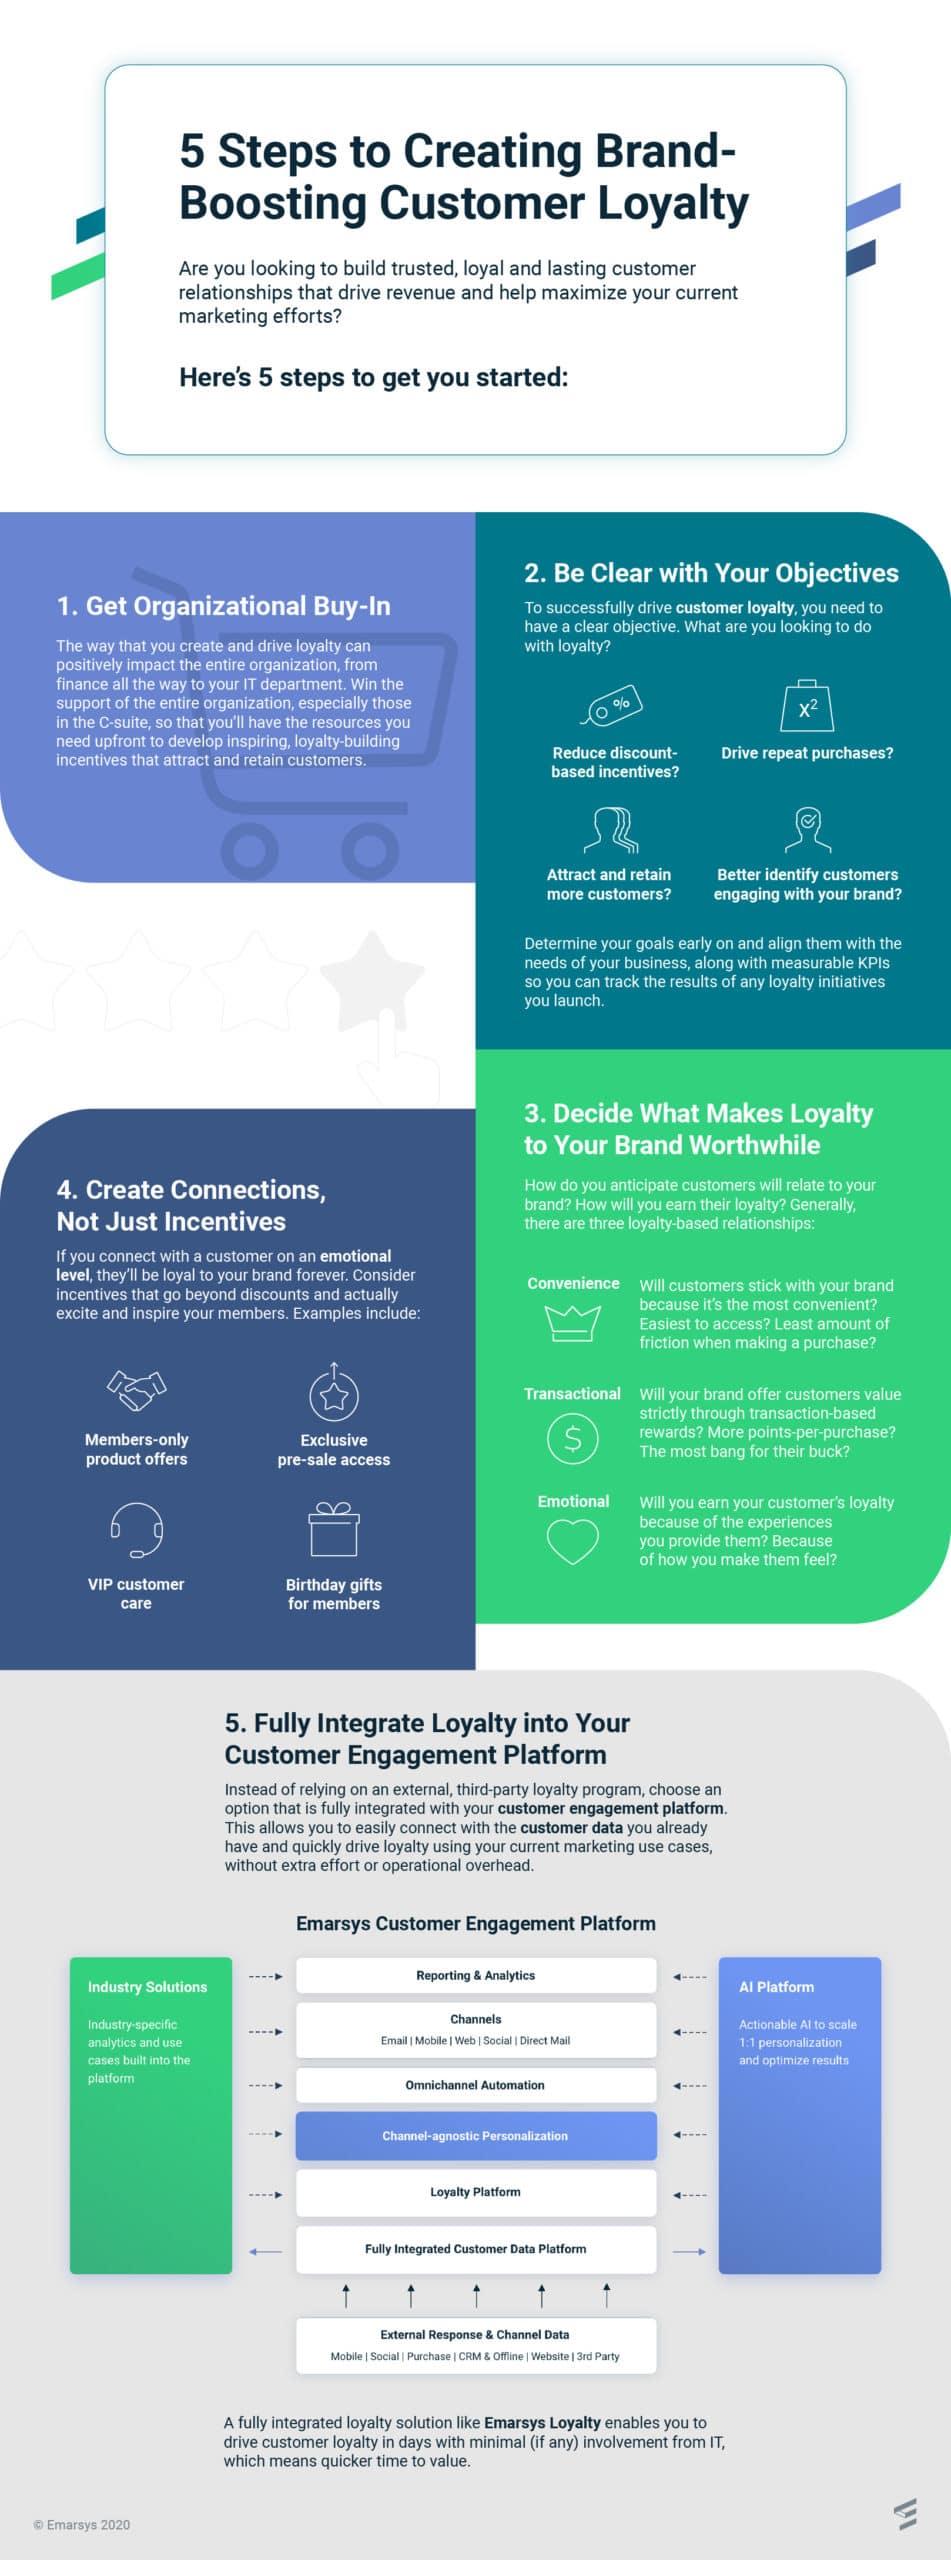 5 Steps to Creating Brand-Boosting Customer Loyalty